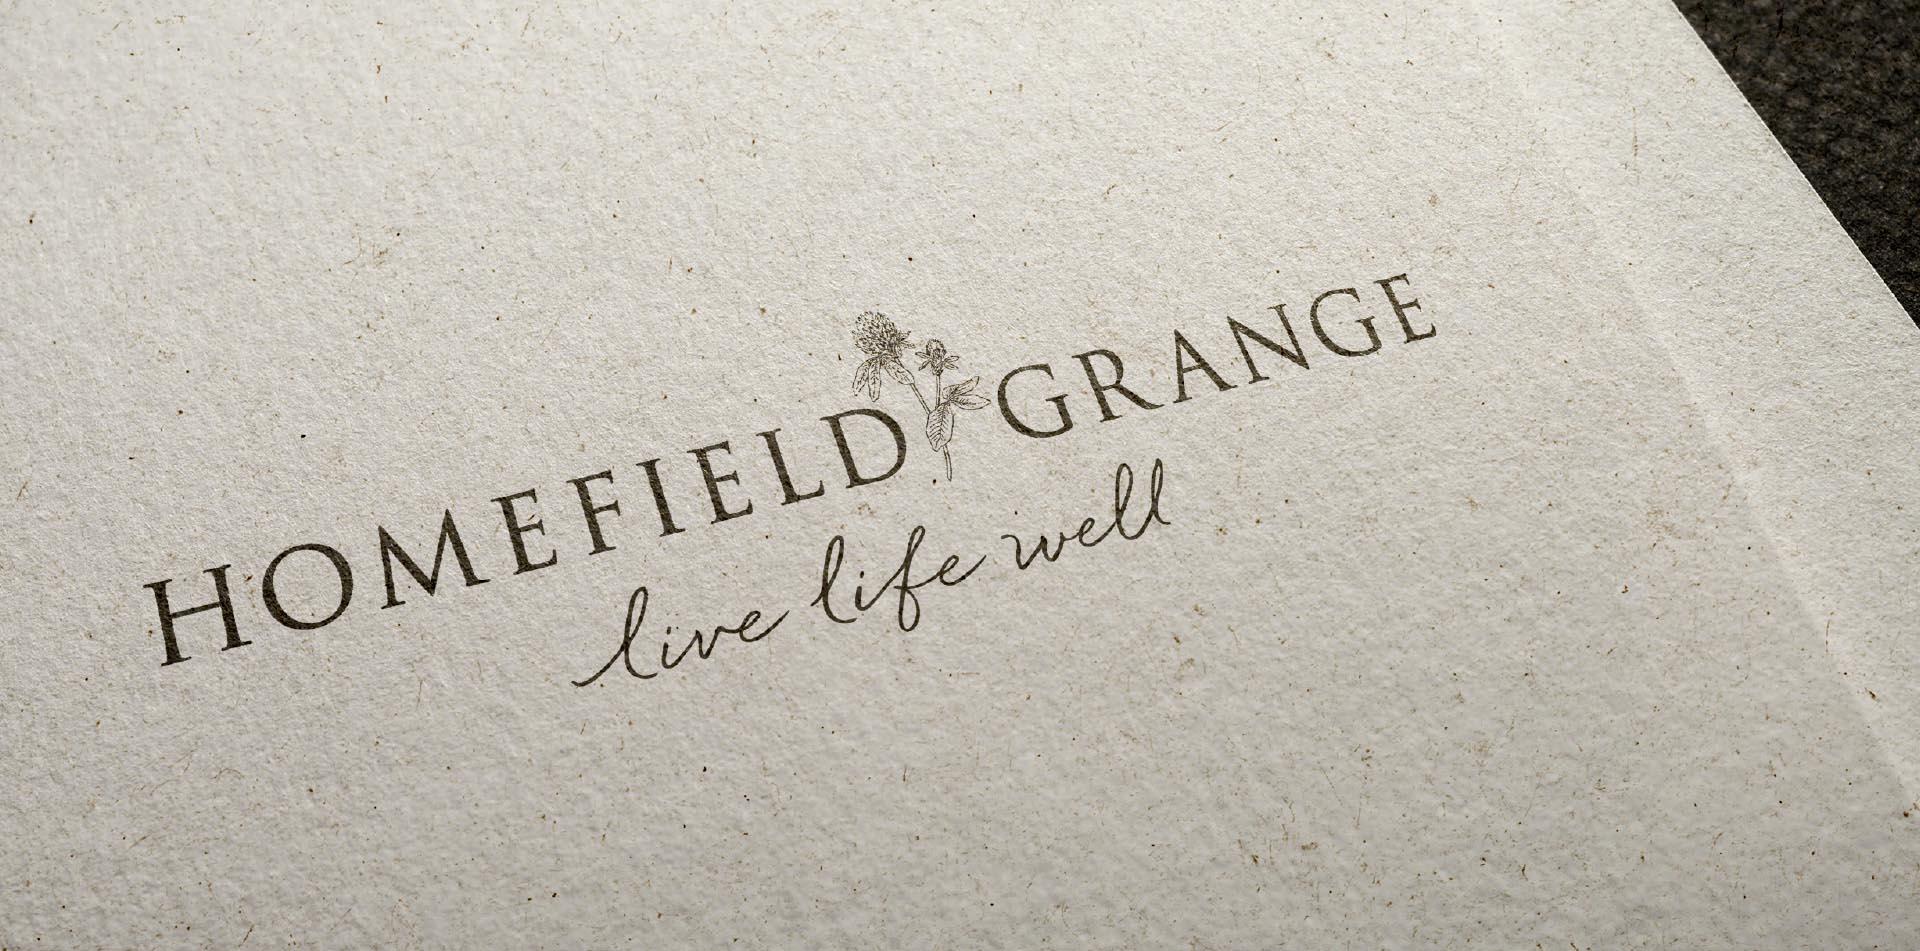 Butterscotch-Design-Homefield-Grange-logo-design-rebrand